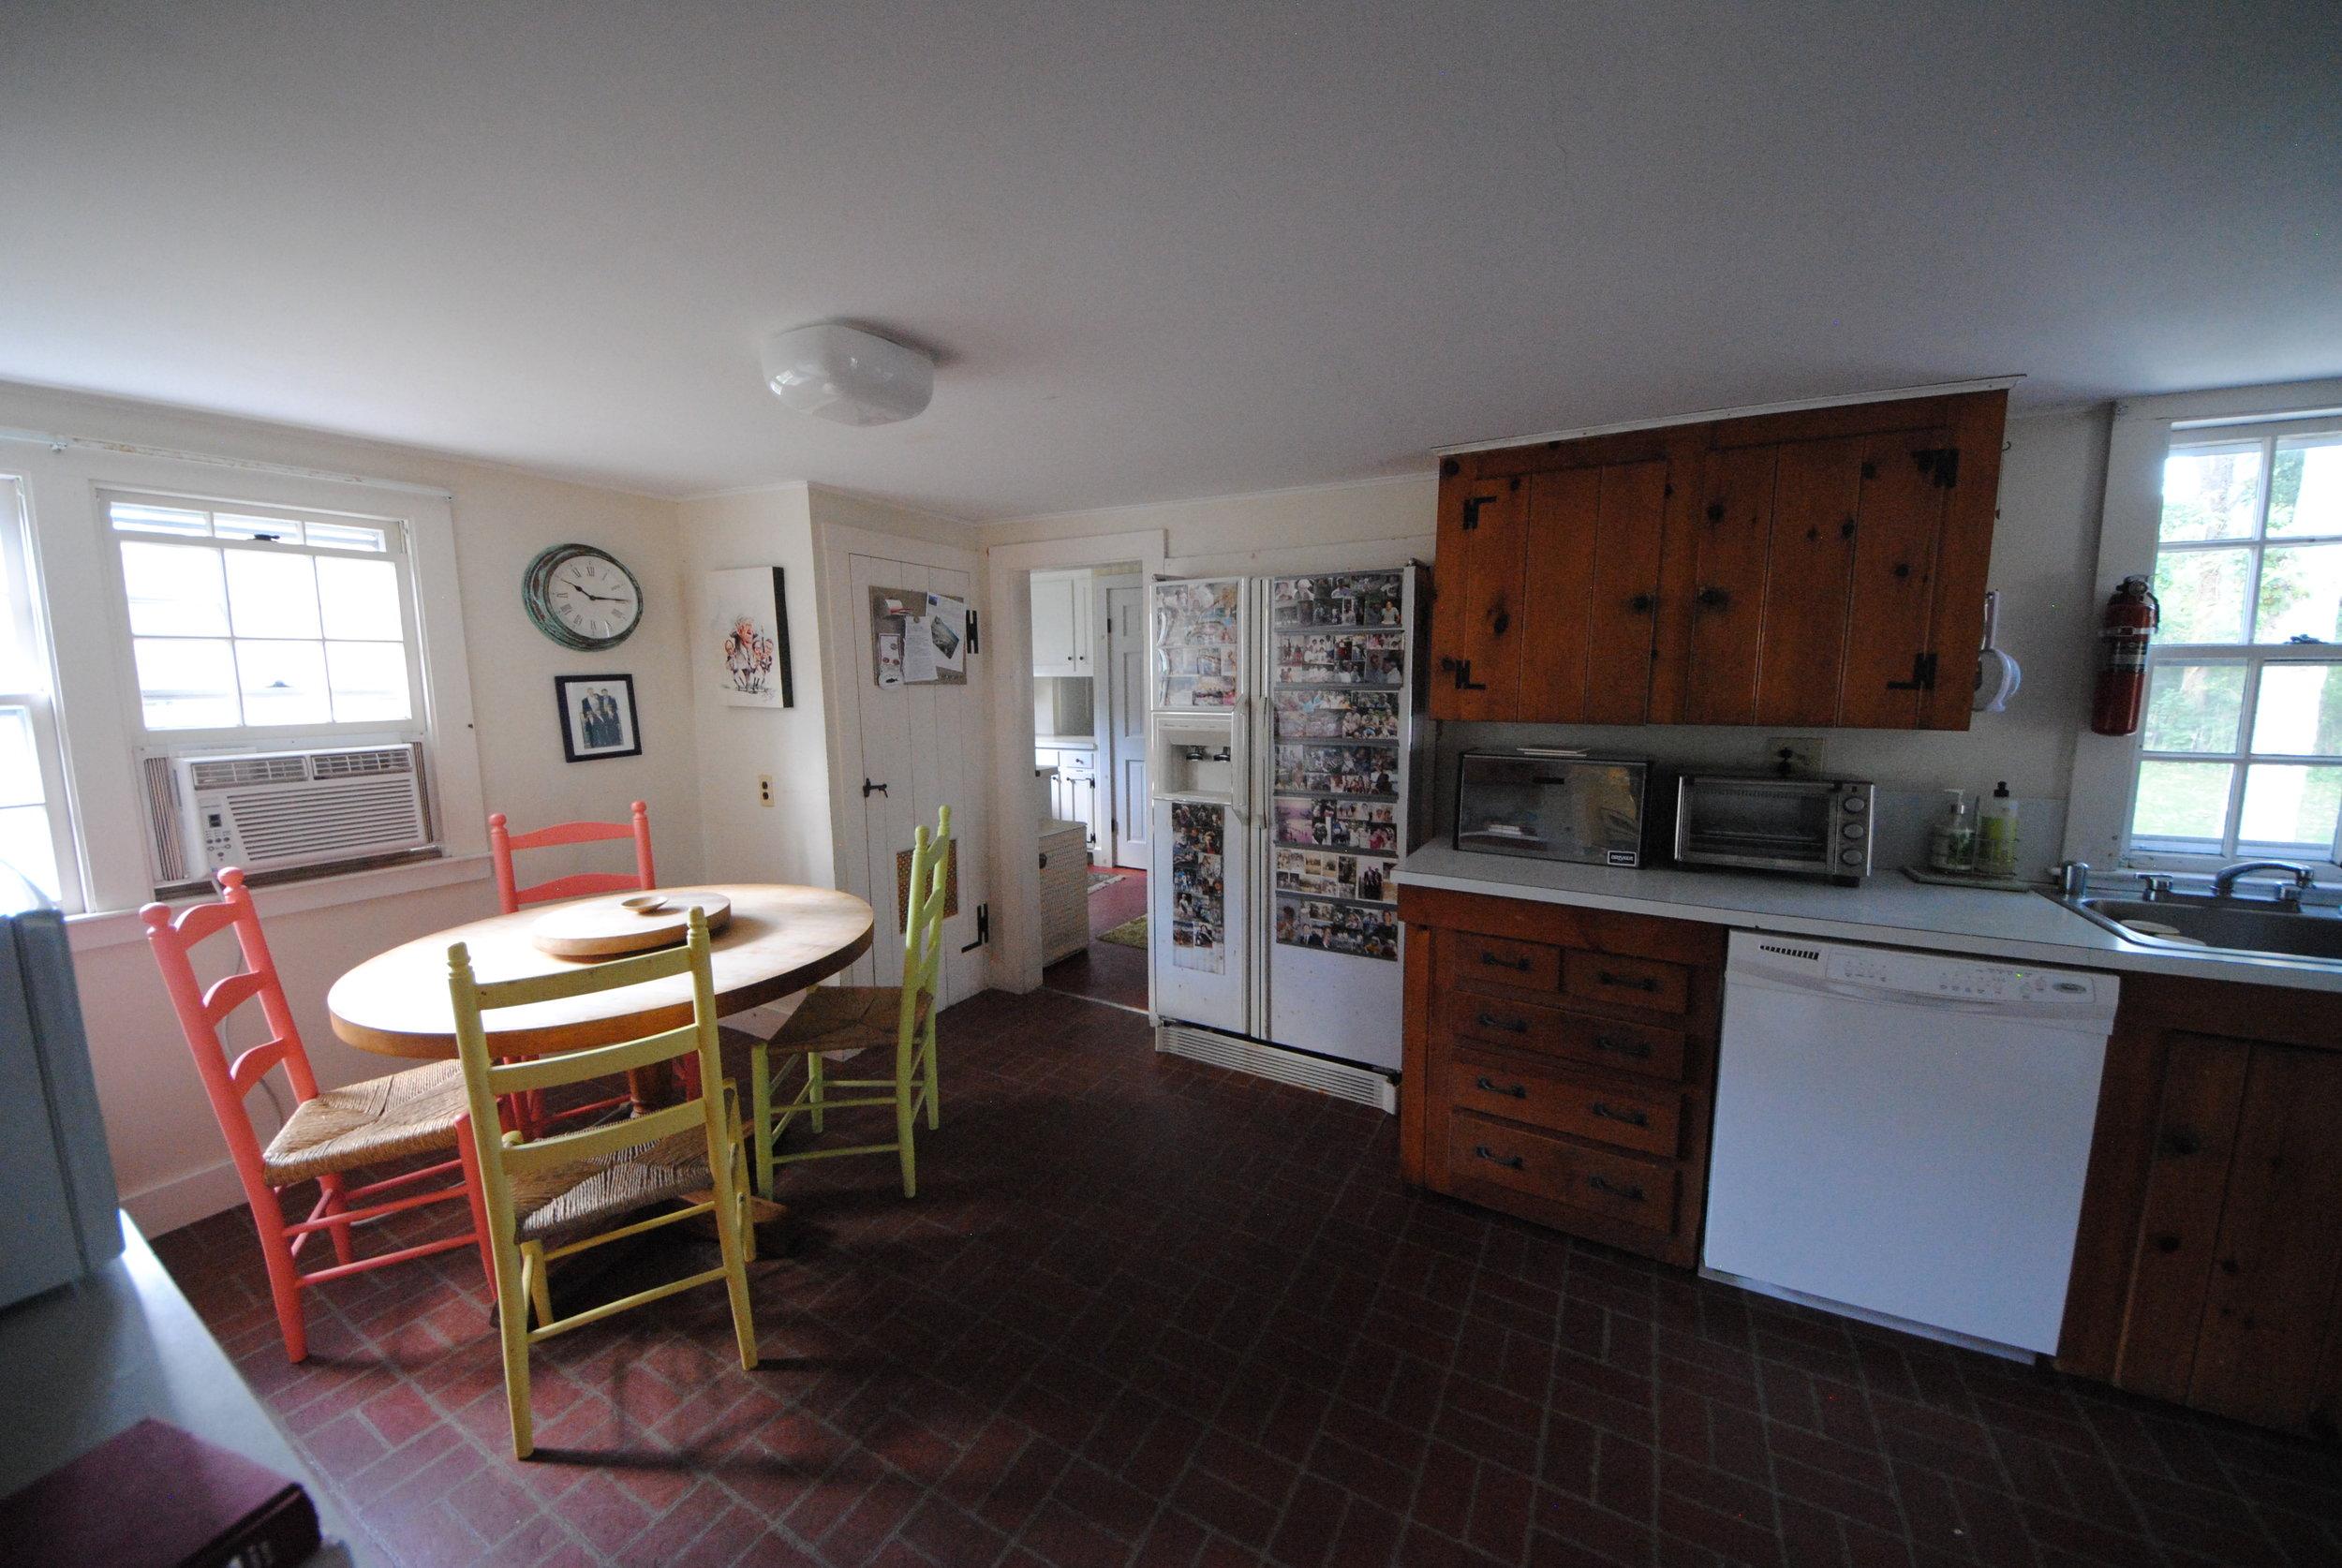 Kitchen before renovation/addition